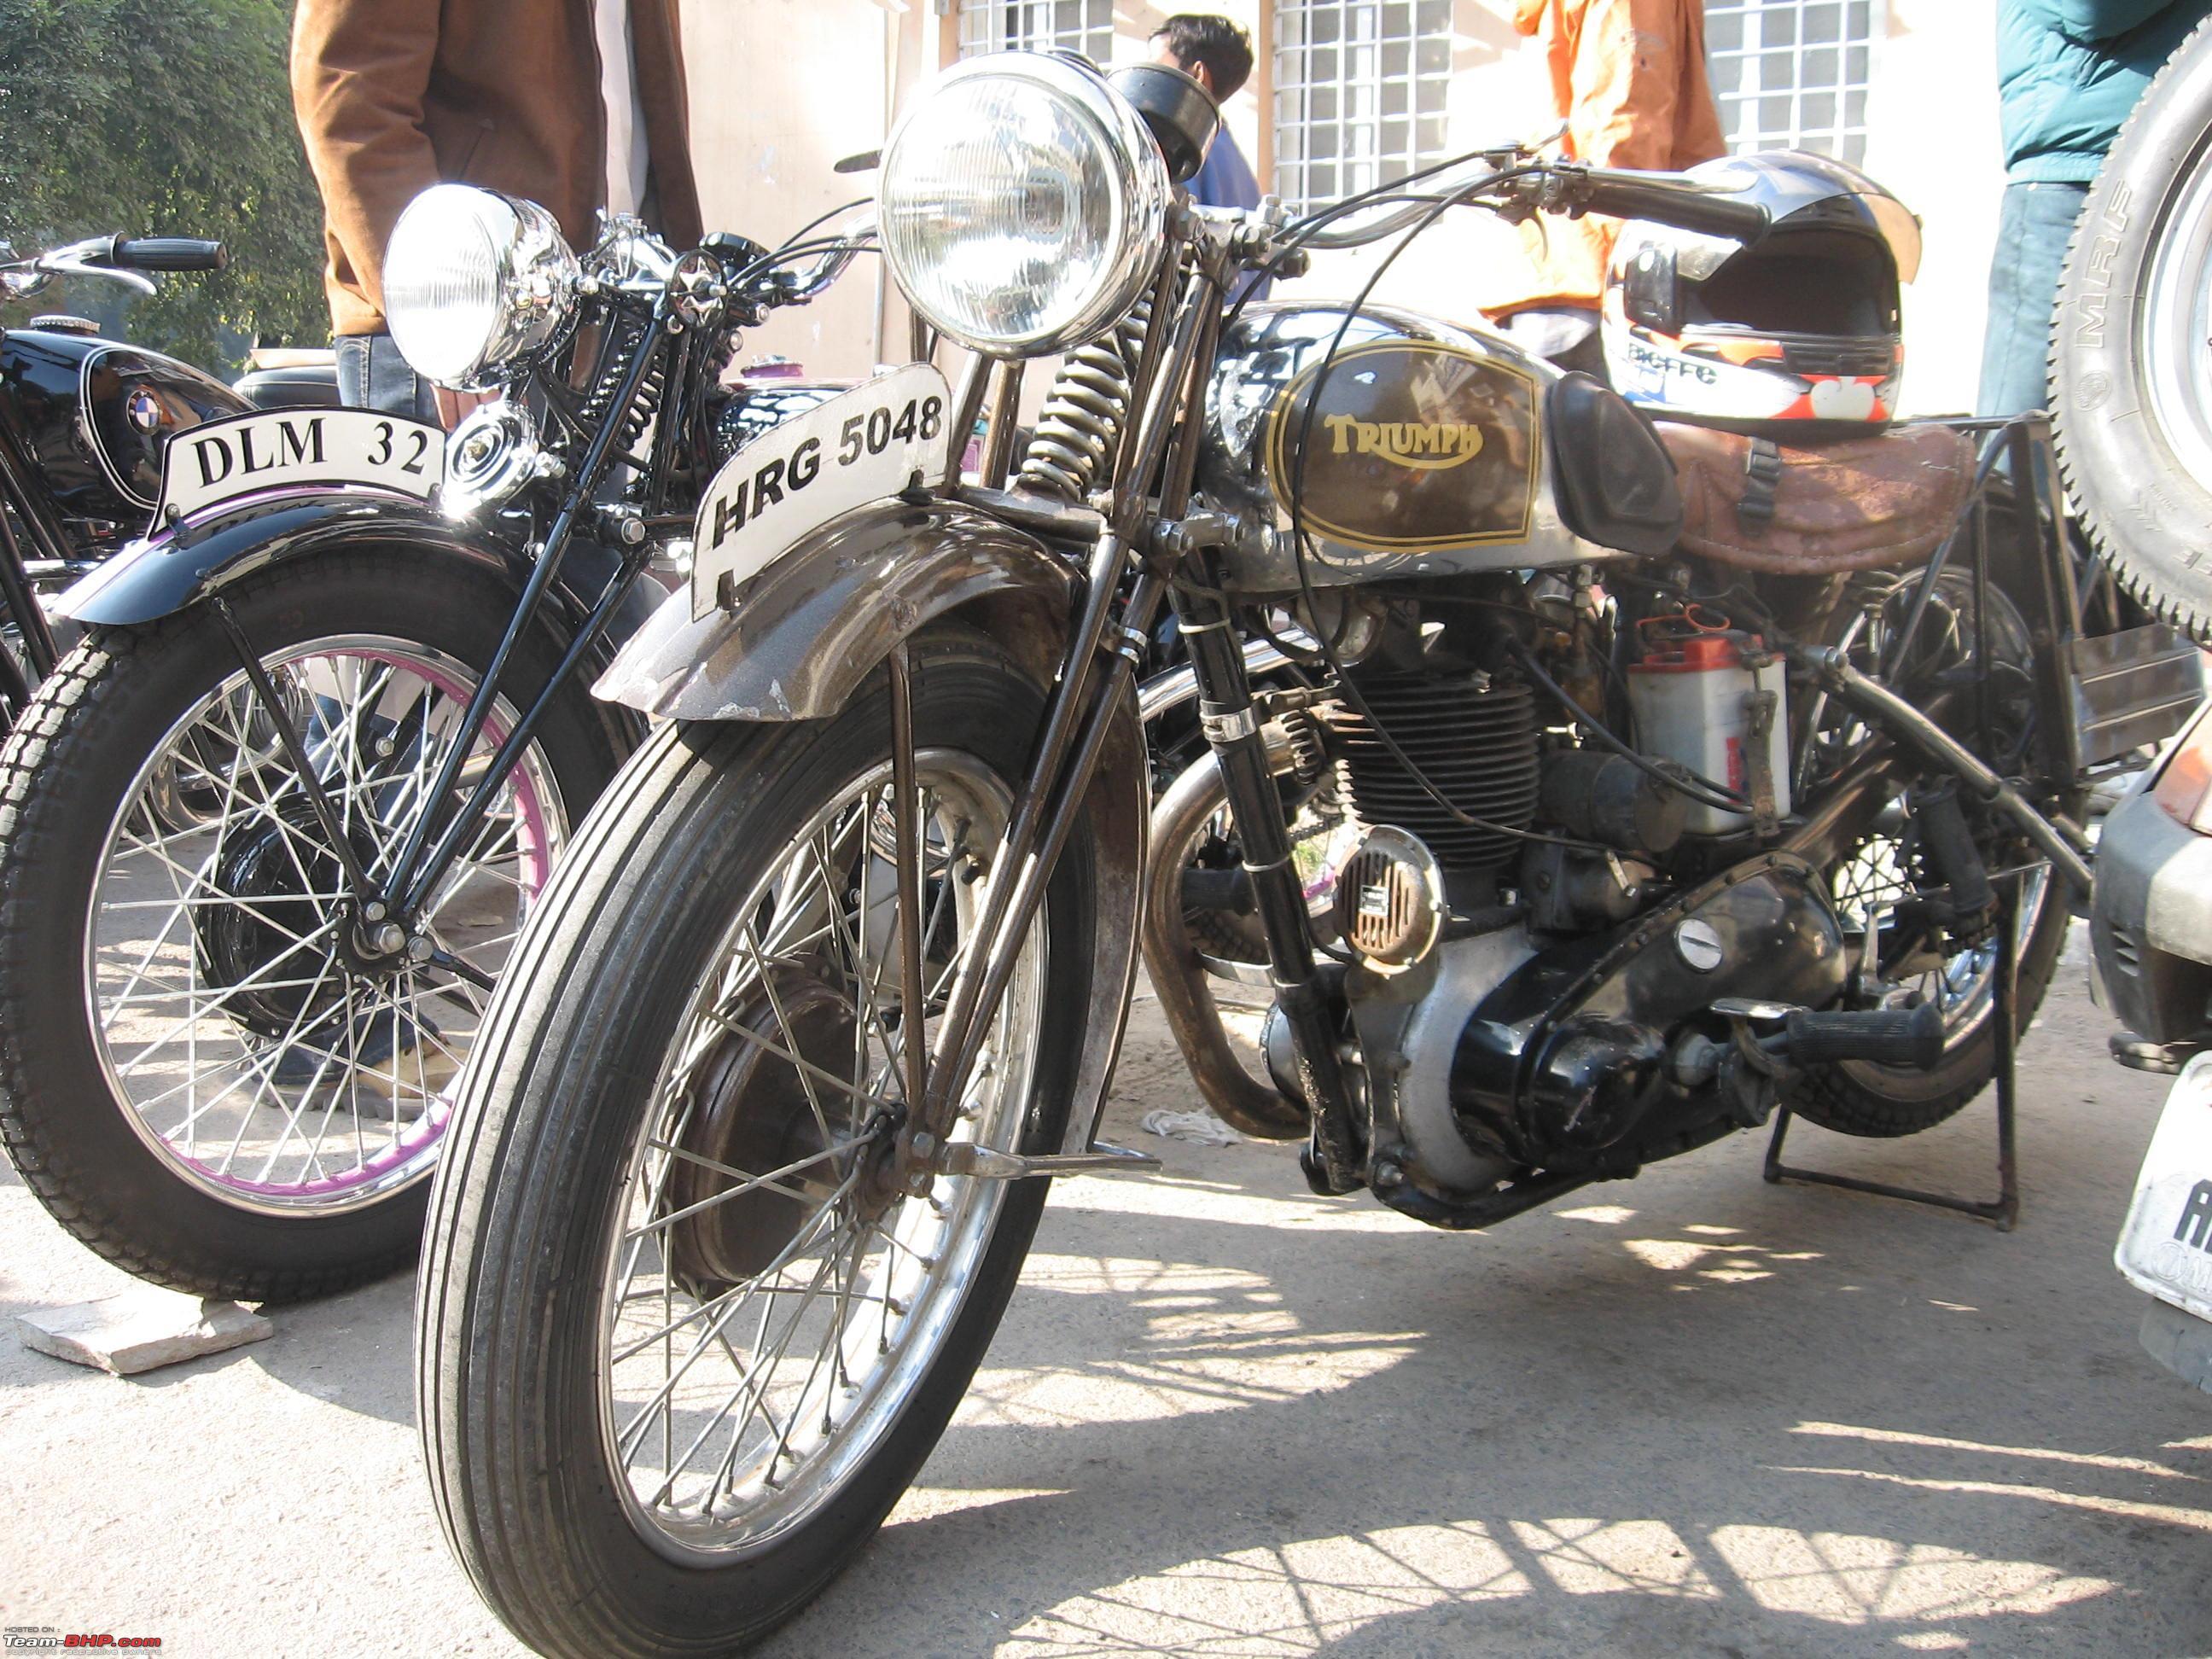 Triumph Bikes - Page 3 - Team-BHP